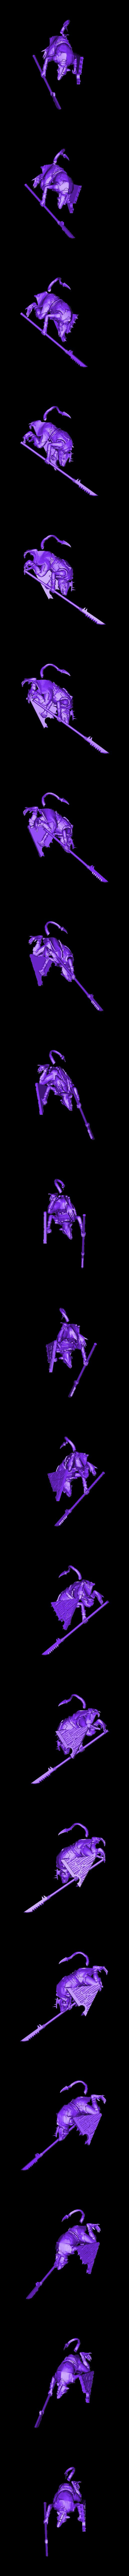 Clanrat_Spear_14.stl Download free 3MF file Gangsta Rats • 3D printer template, EmanG